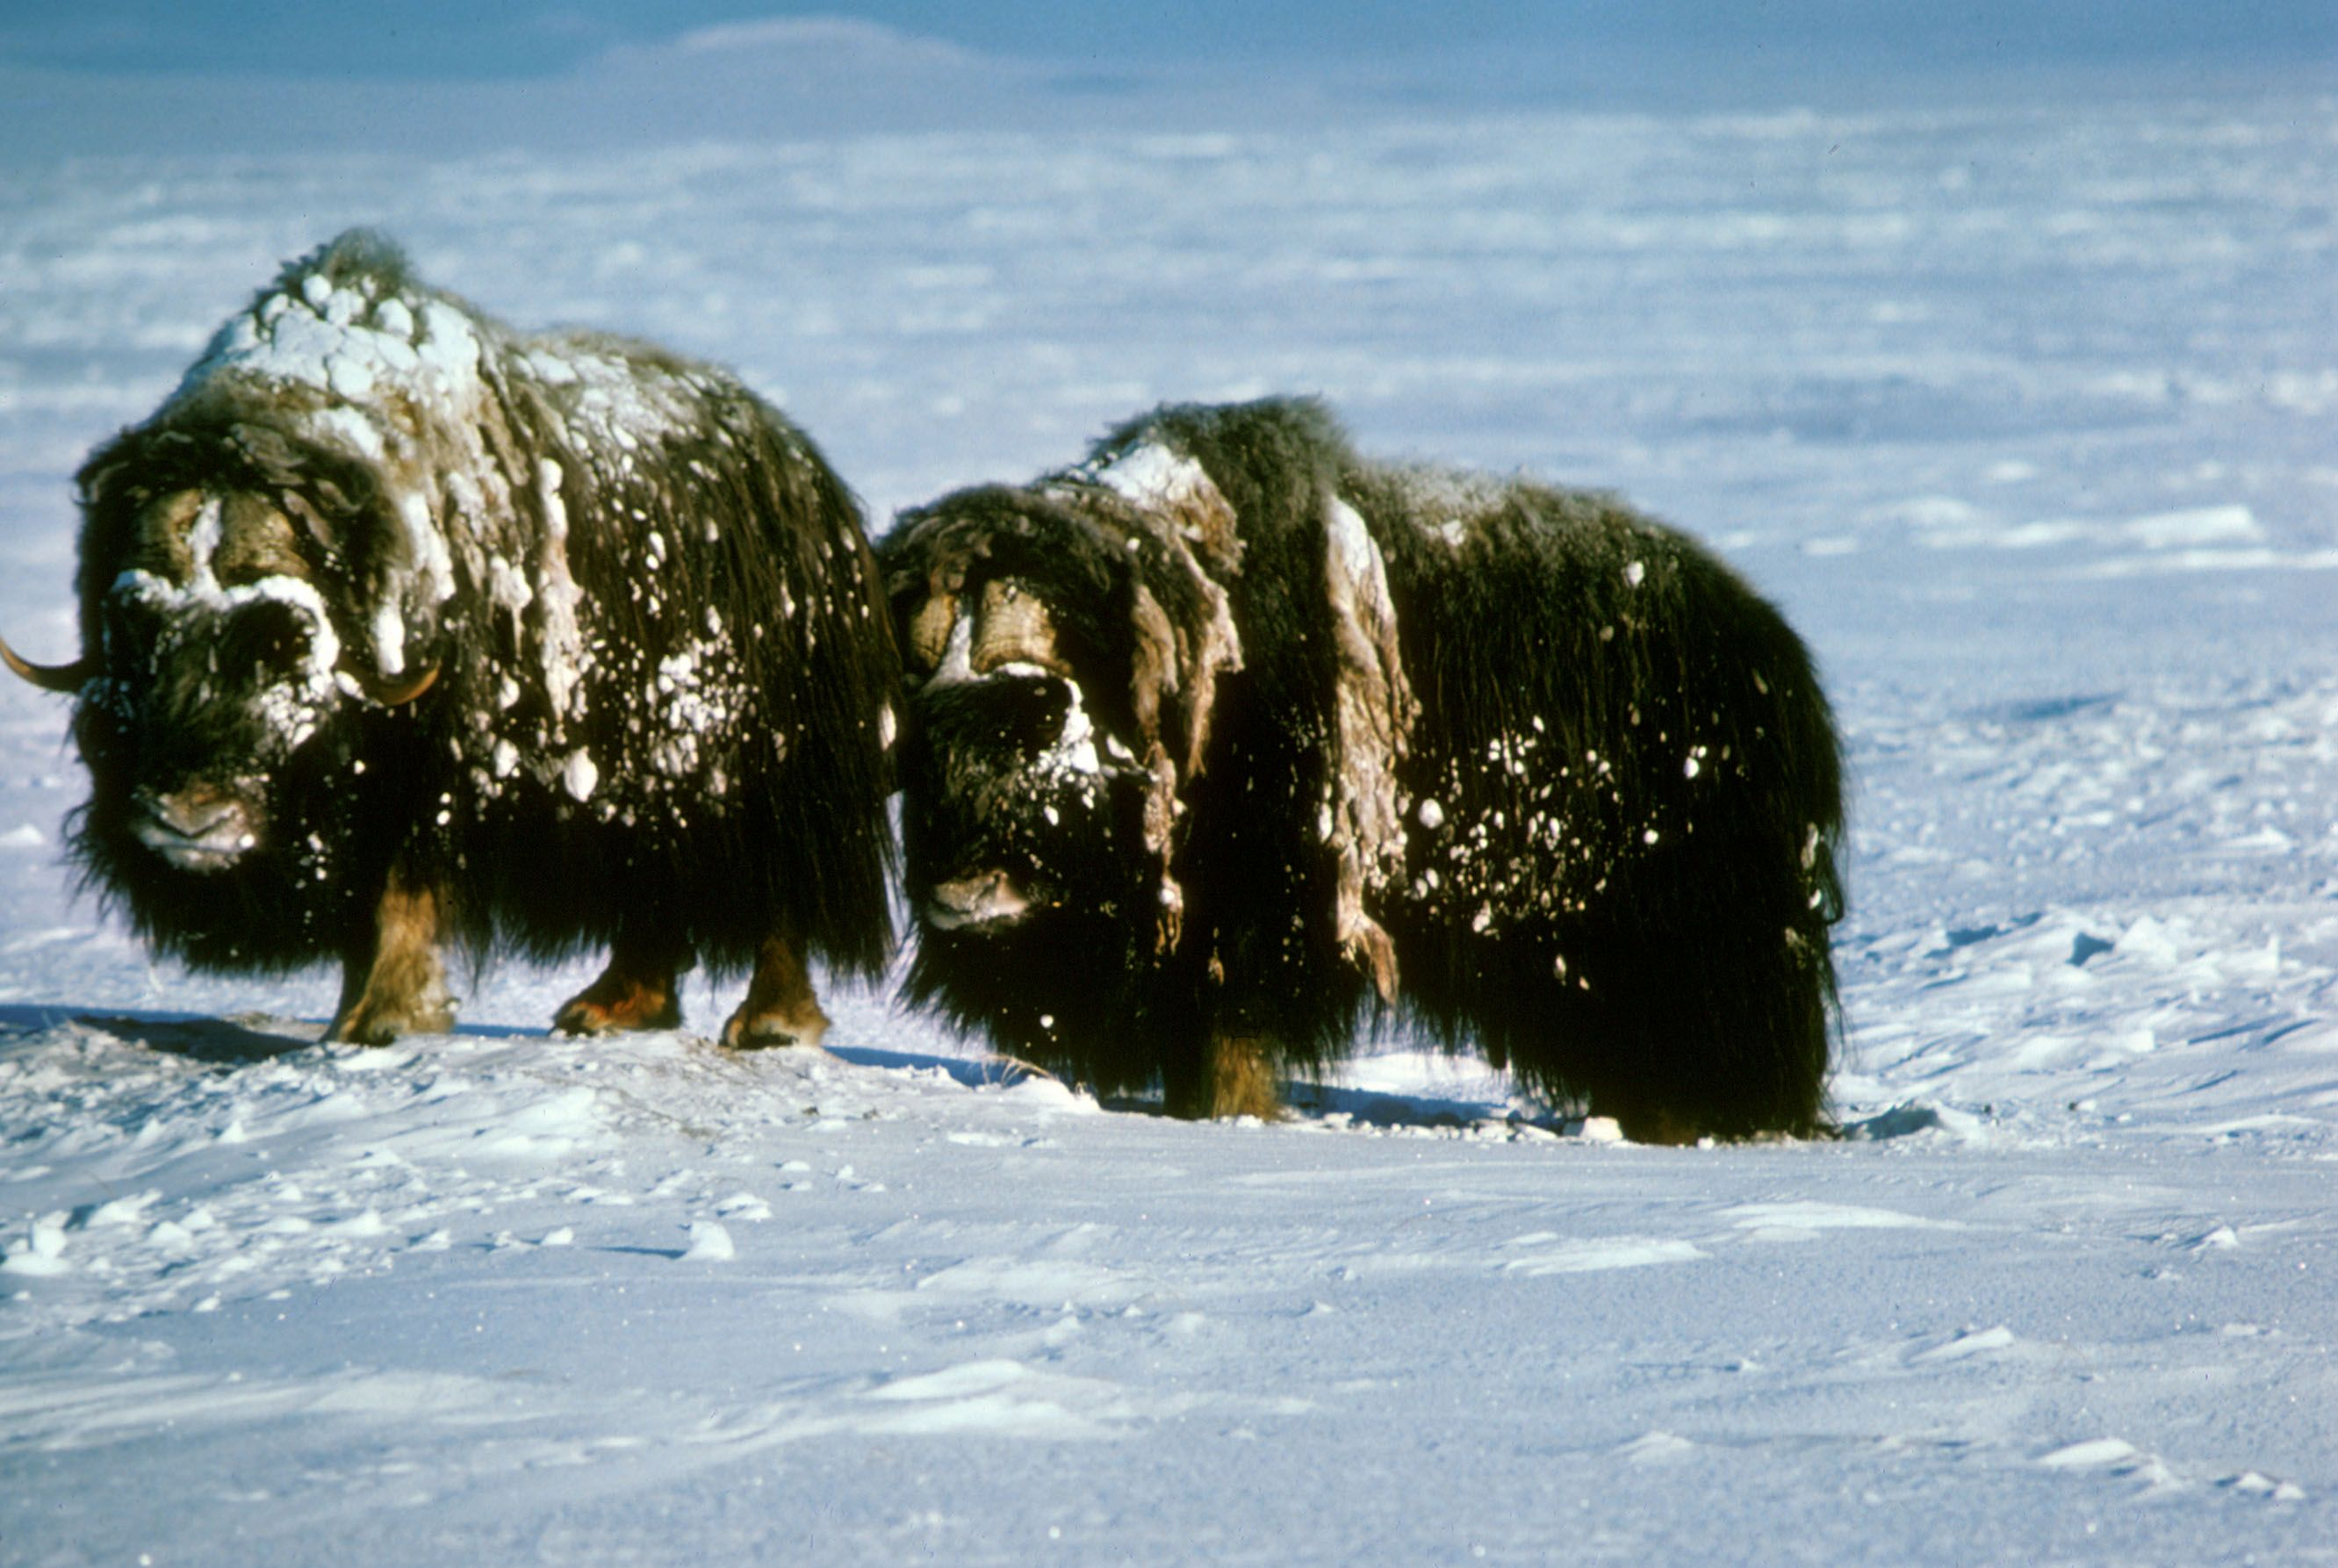 Arctic Tundra Musk Oxen Arctic Tundra Animals Arctic Tundra Musk Ox